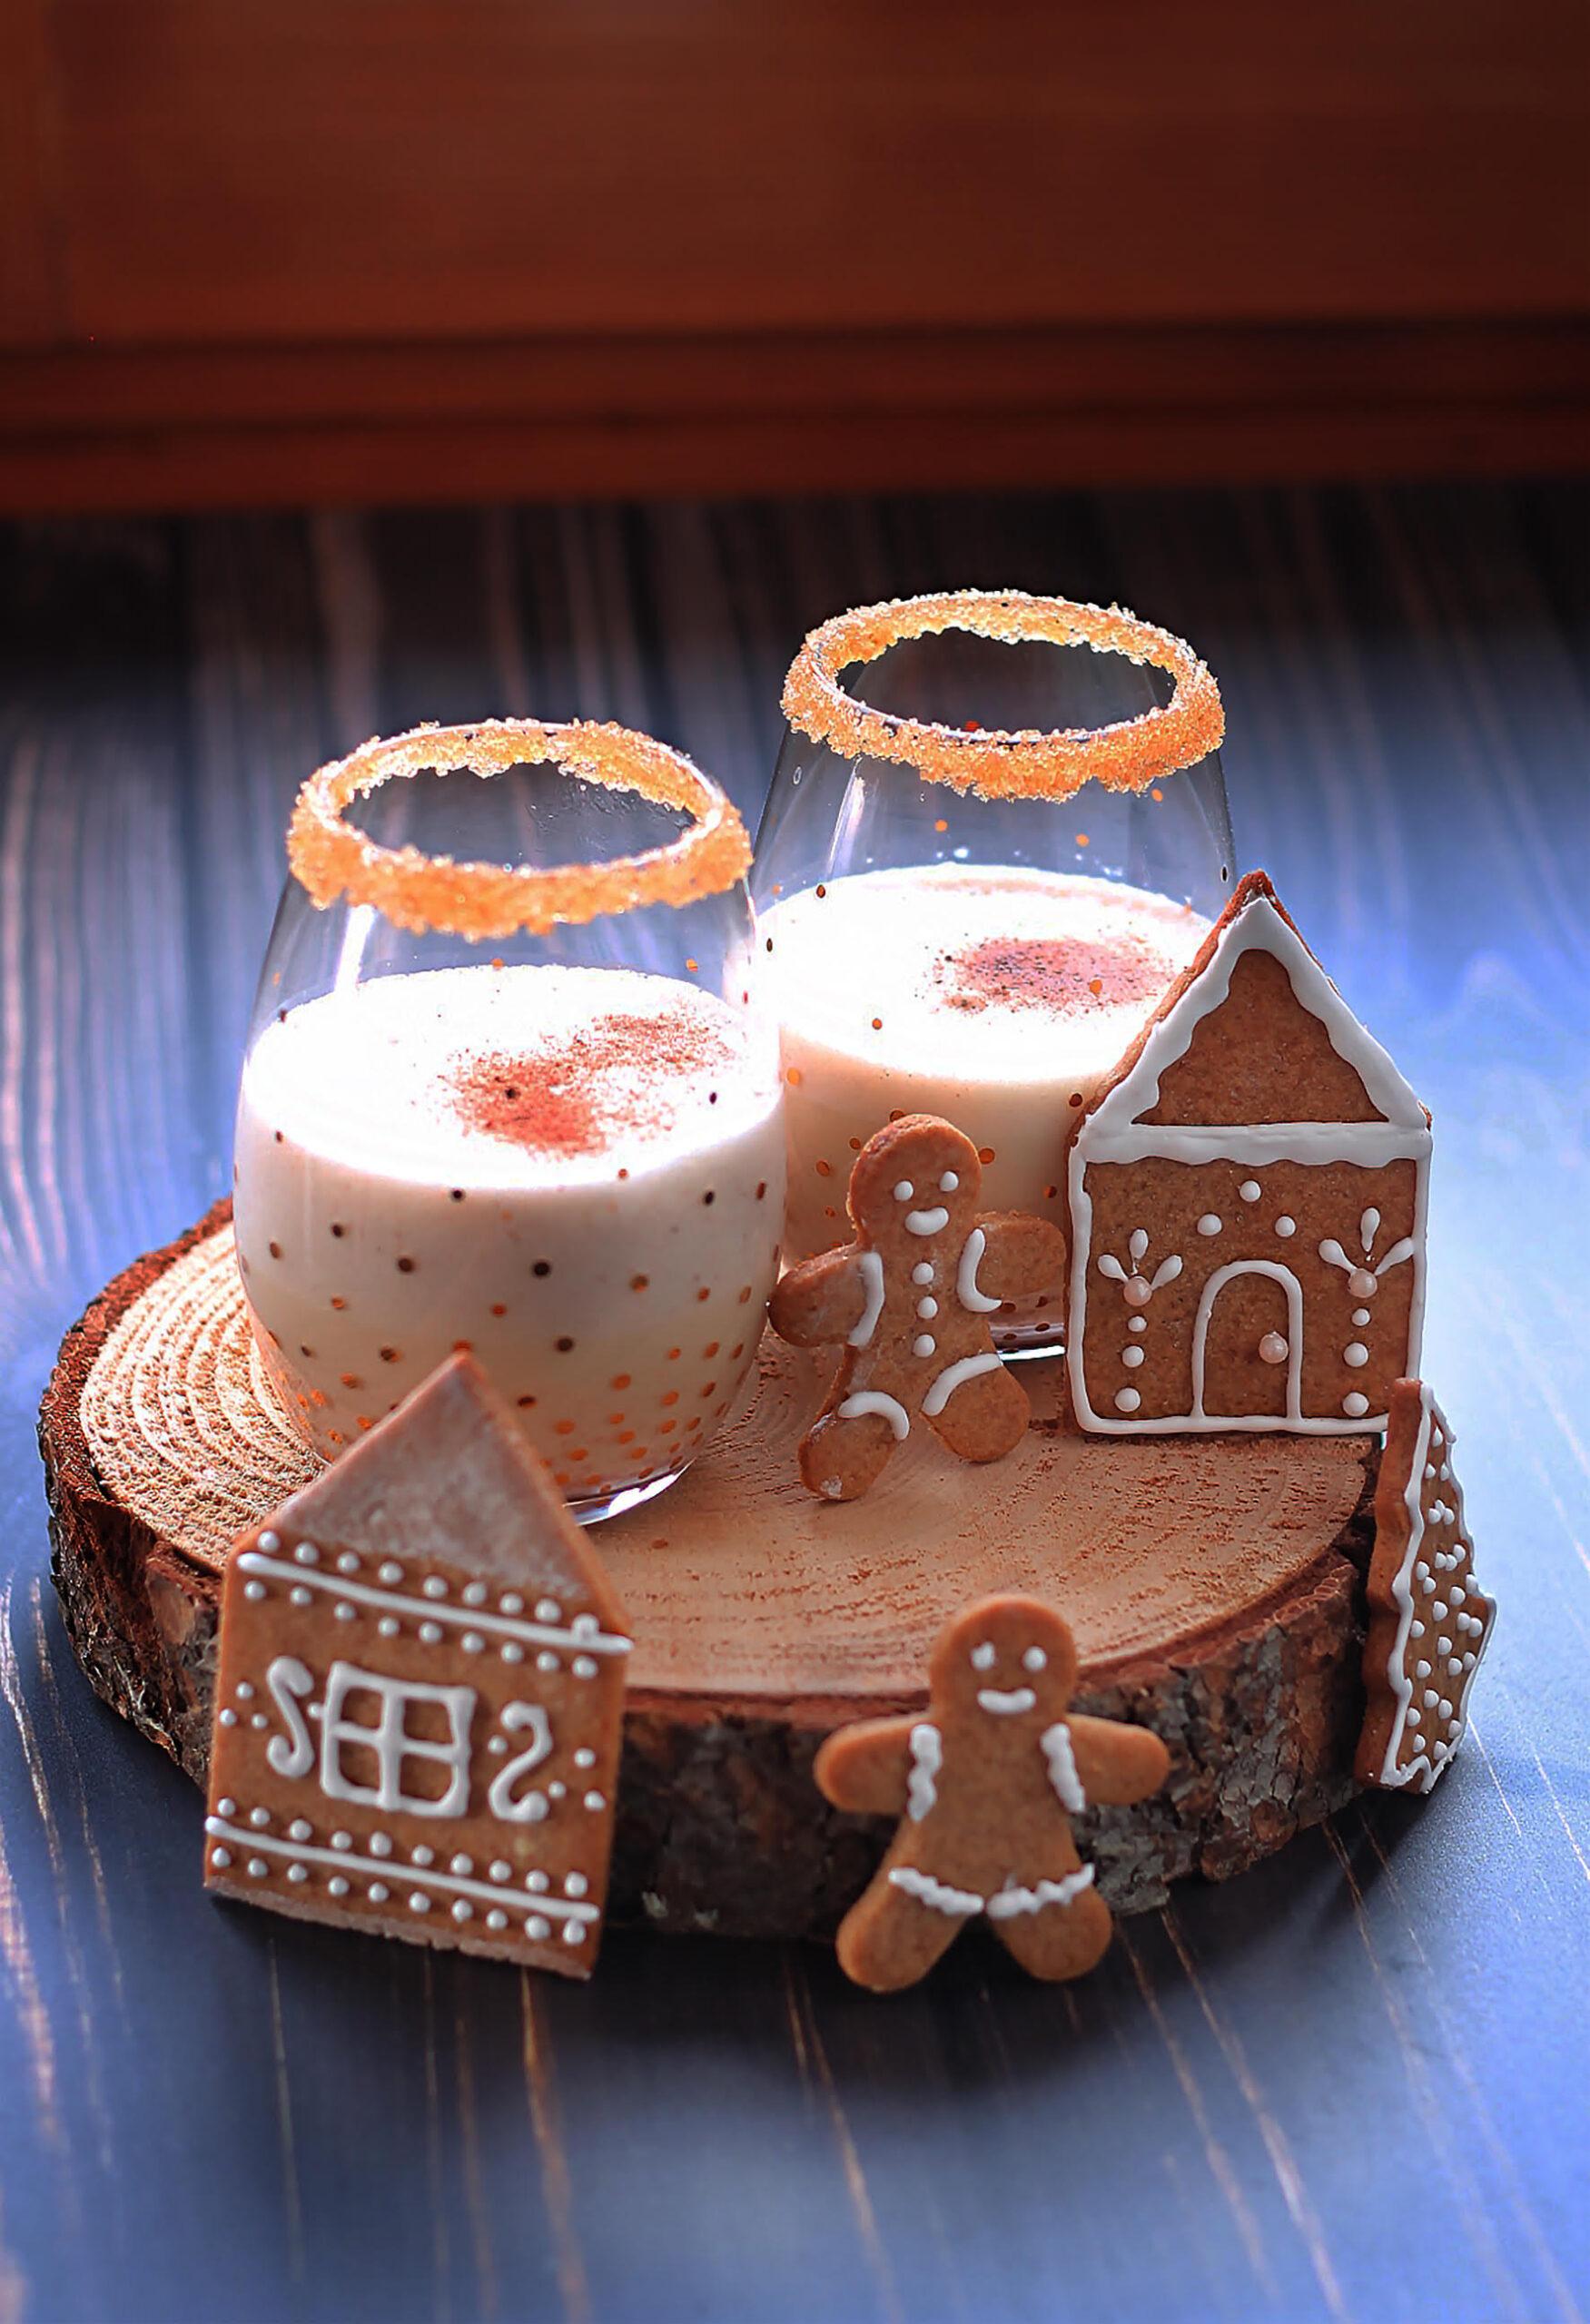 Eggnog con gingerbread